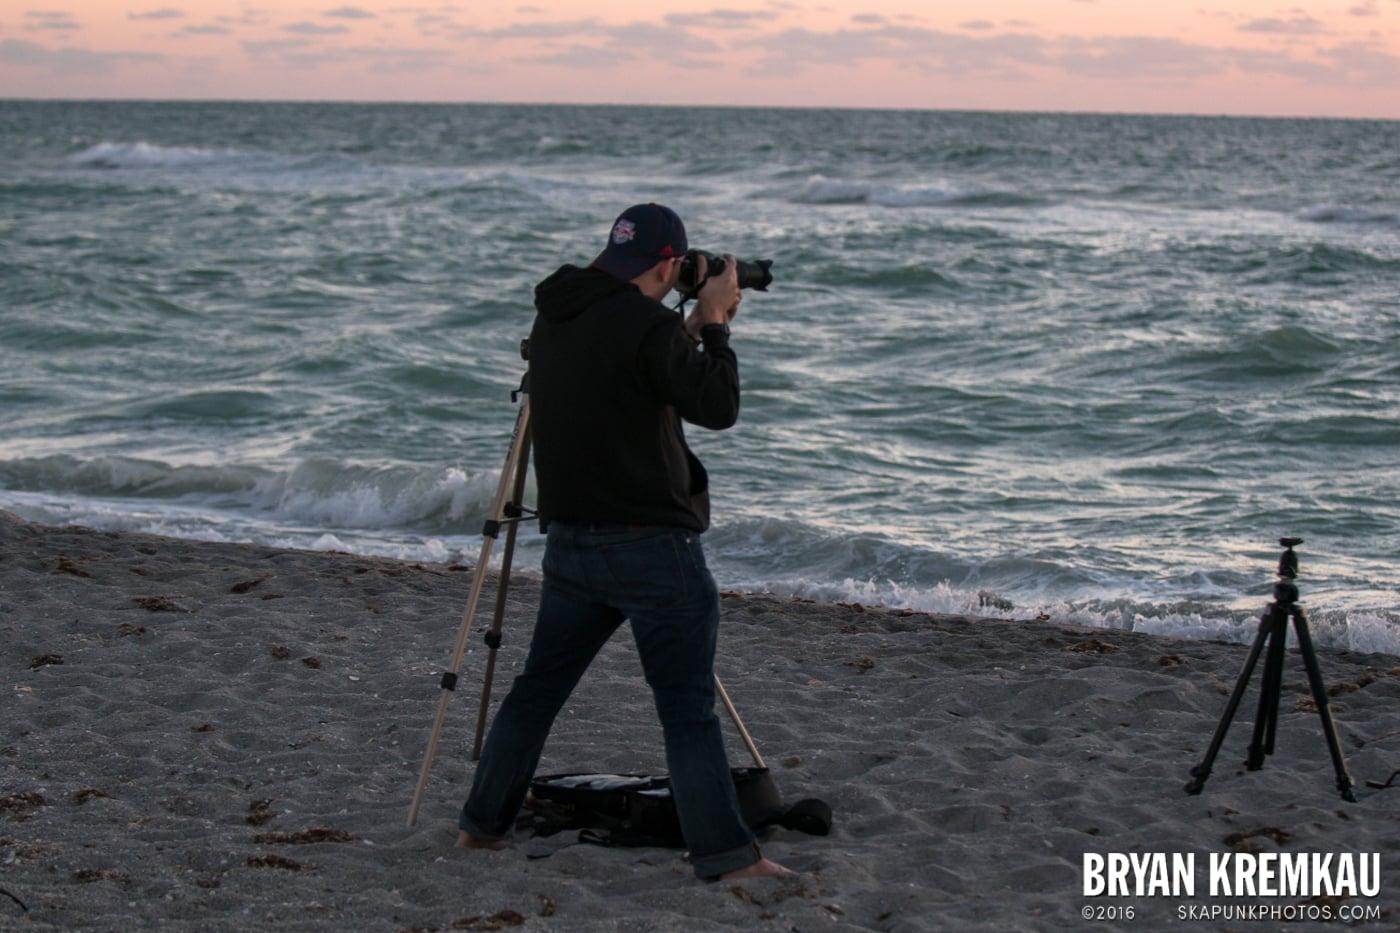 Sunsets, Astrophotography & Birds @ Venice, Florida - 10.25.14 - 11.5.14 (94)